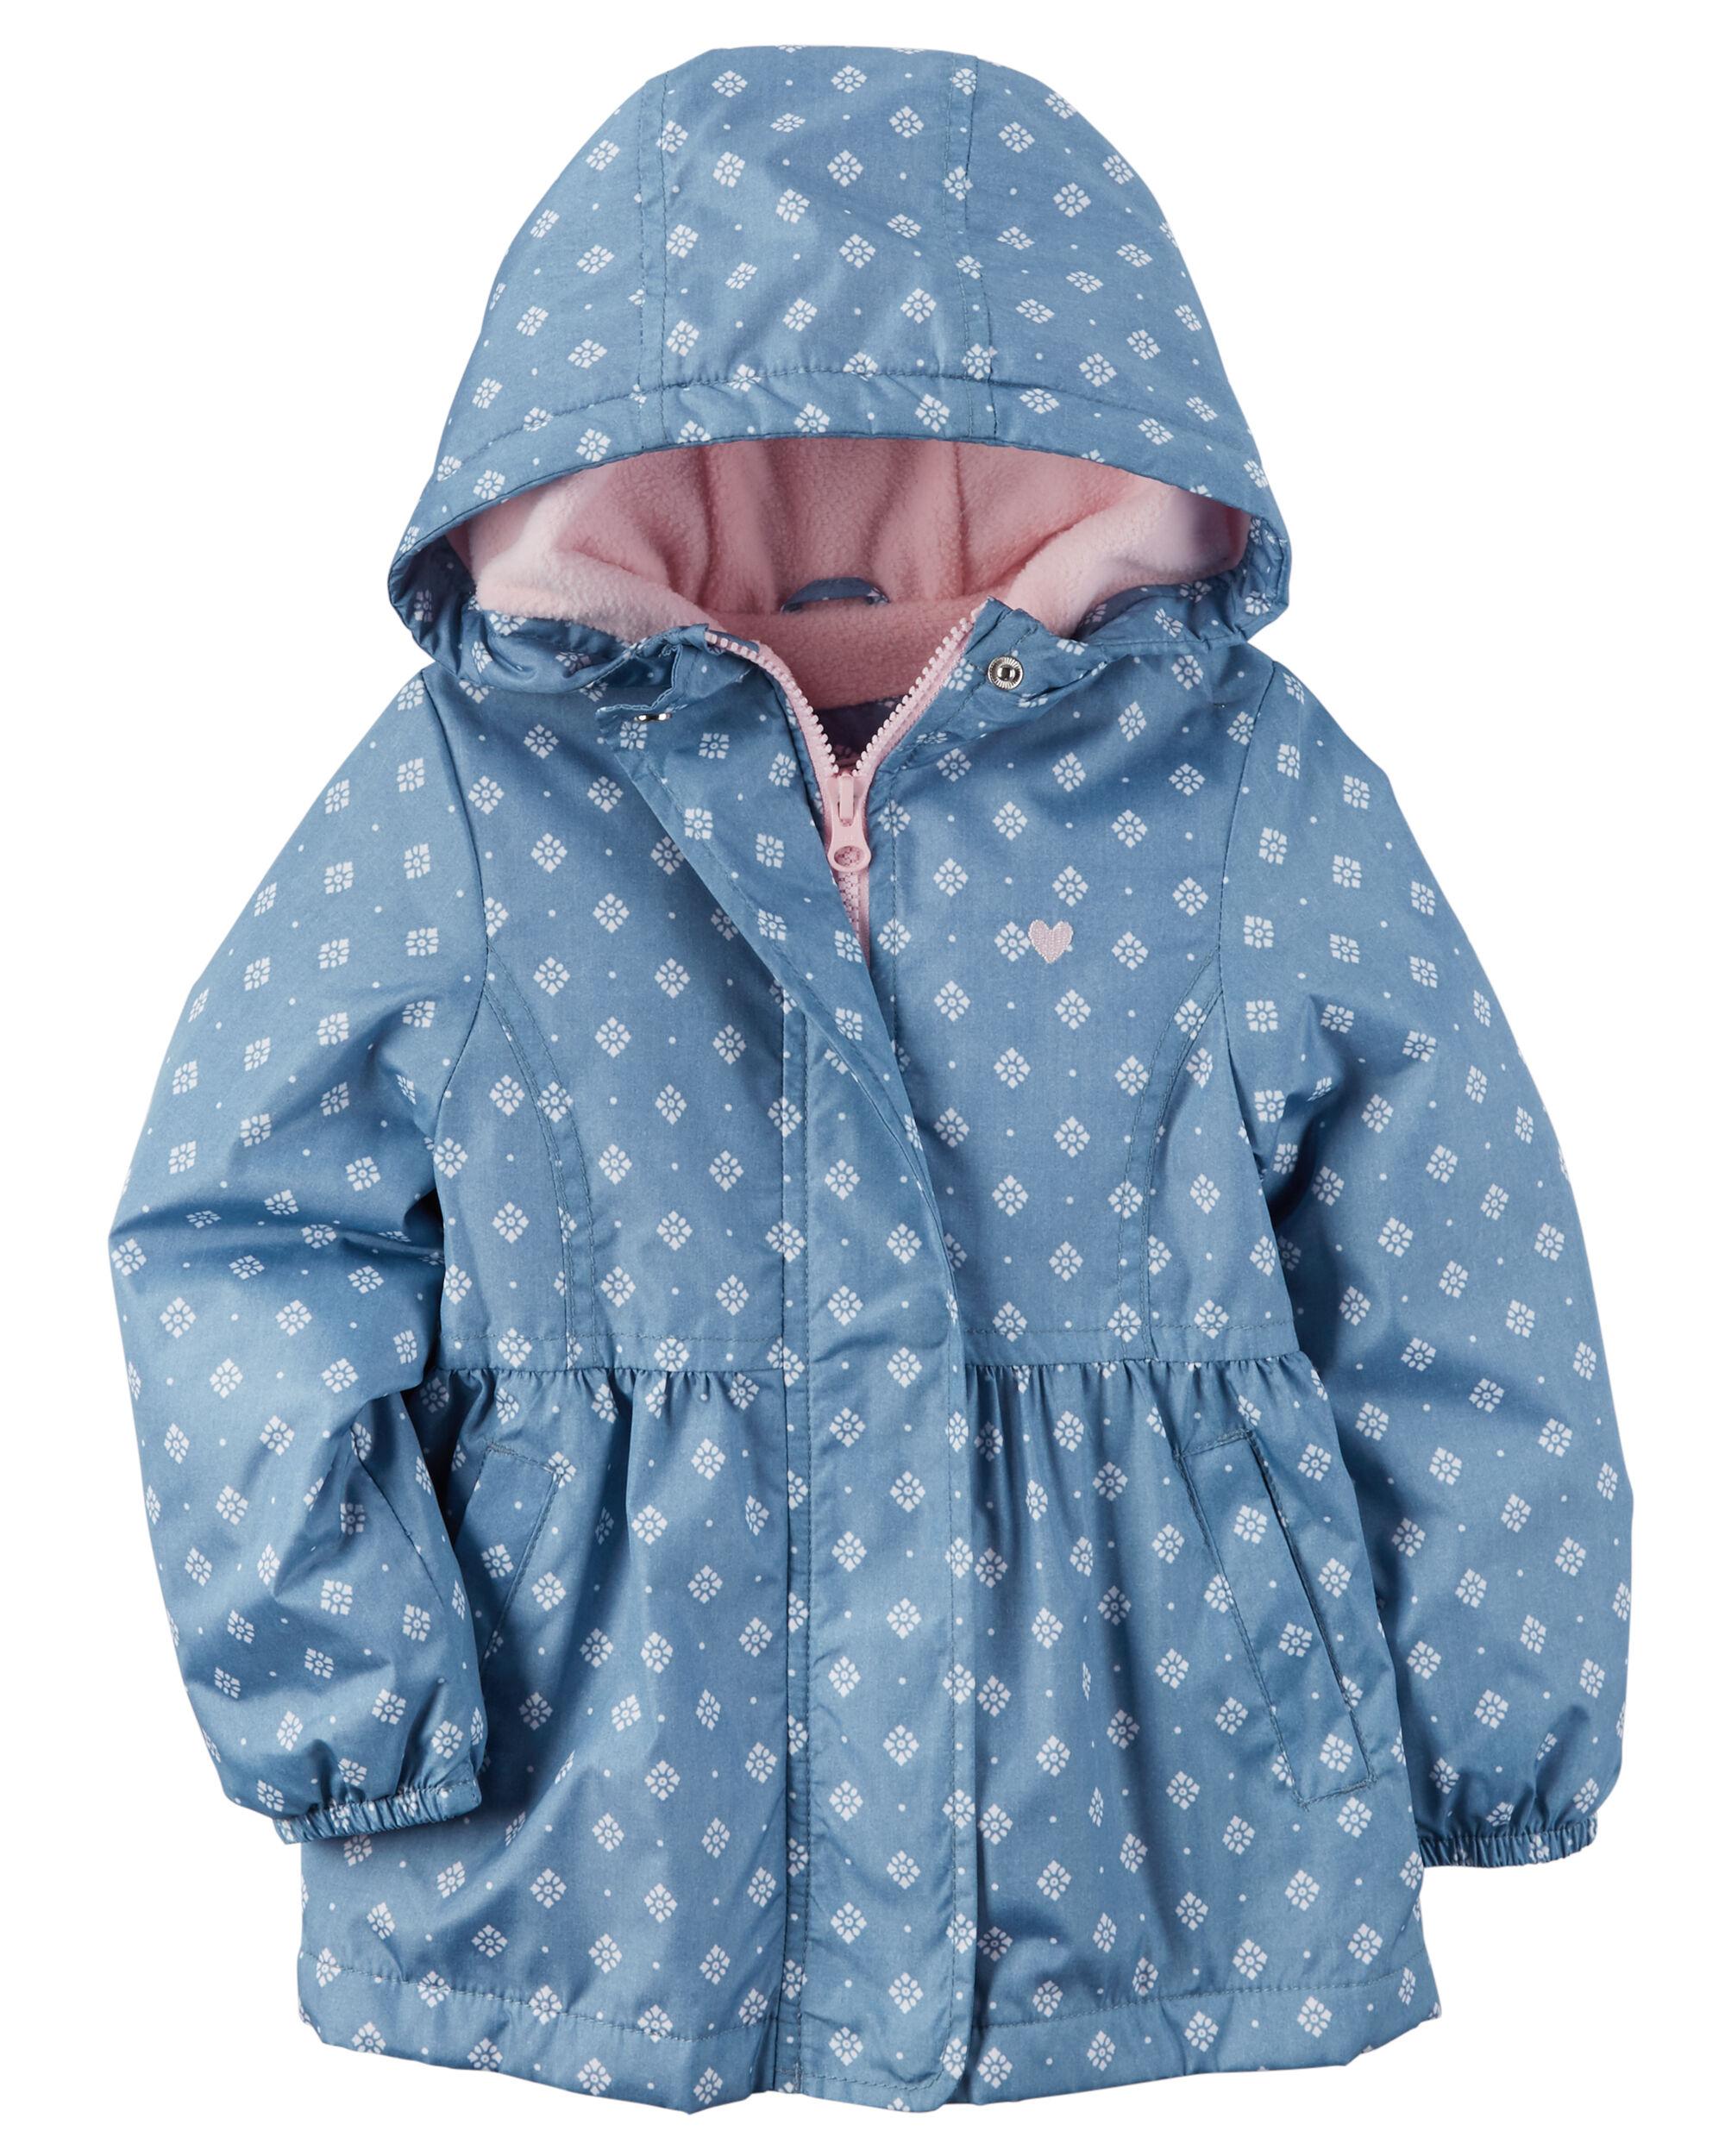 Carter/'s Toddler Girls Pink Midweight Fleece Lined Windbreaker Size 2T 3T 4T $50